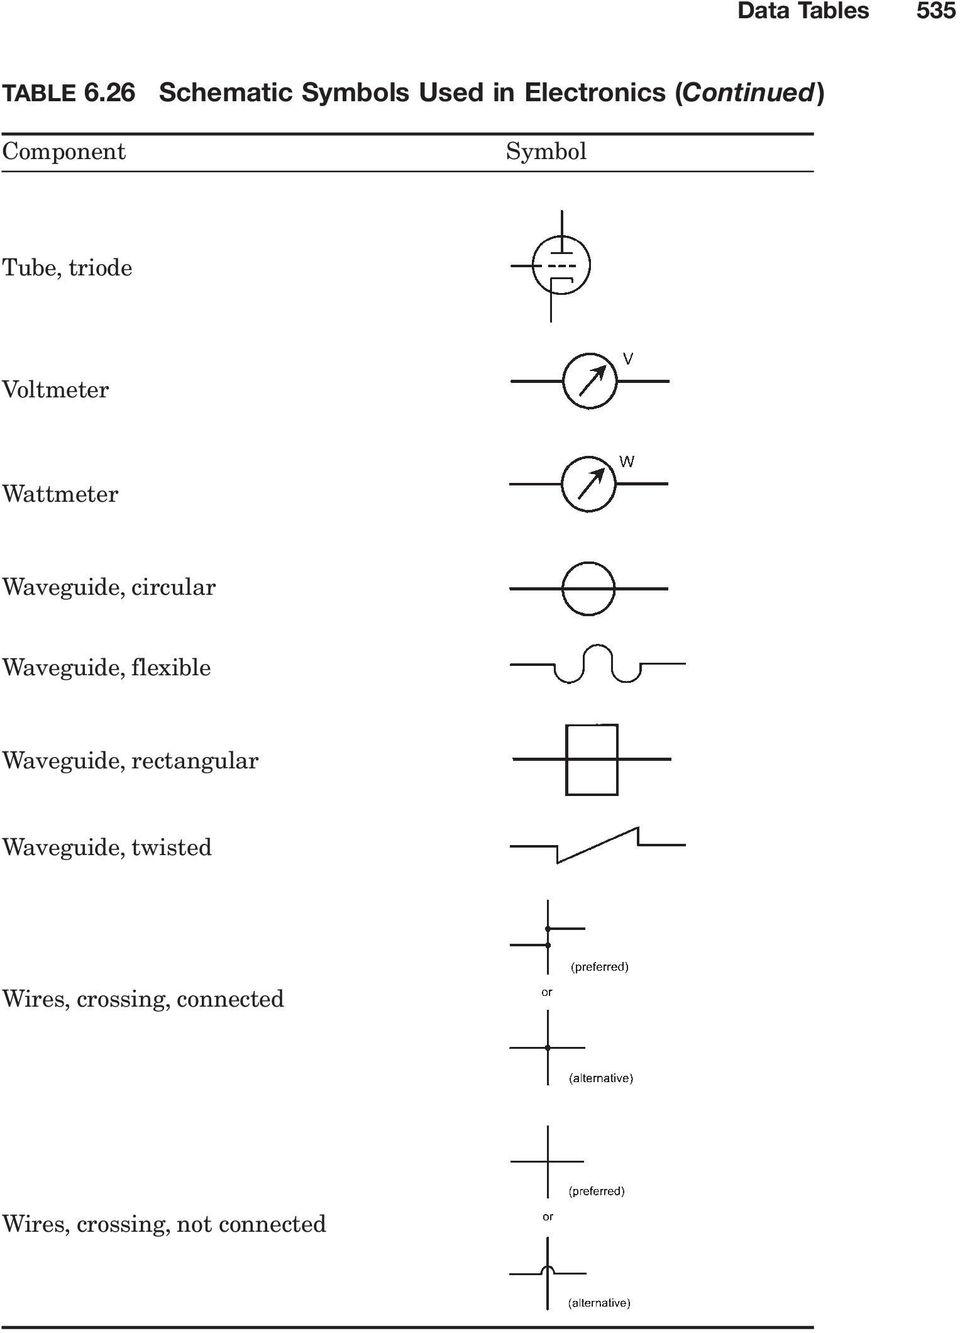 medium resolution of circular waveguide flexible waveguide rectangular